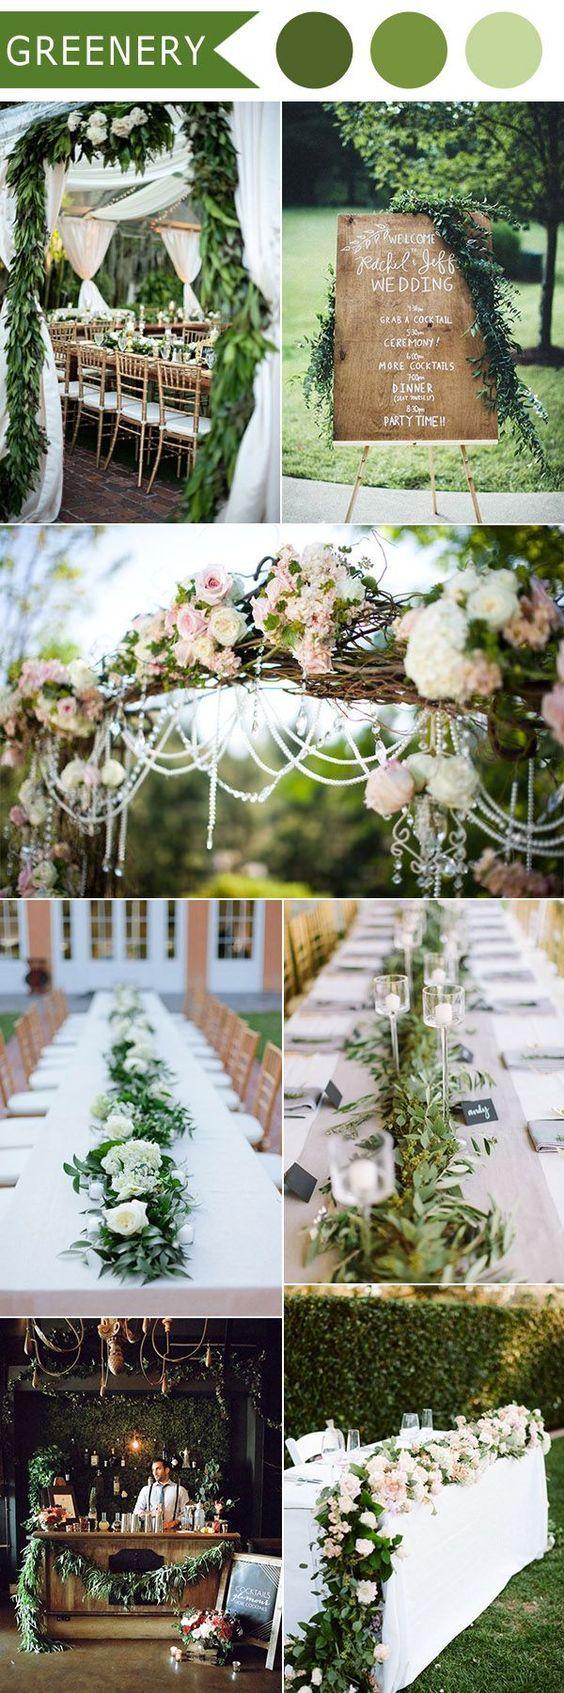 Wedding decorations natural   Trending Wedding Theme Ideas for   Greenery LUSH and Elegant